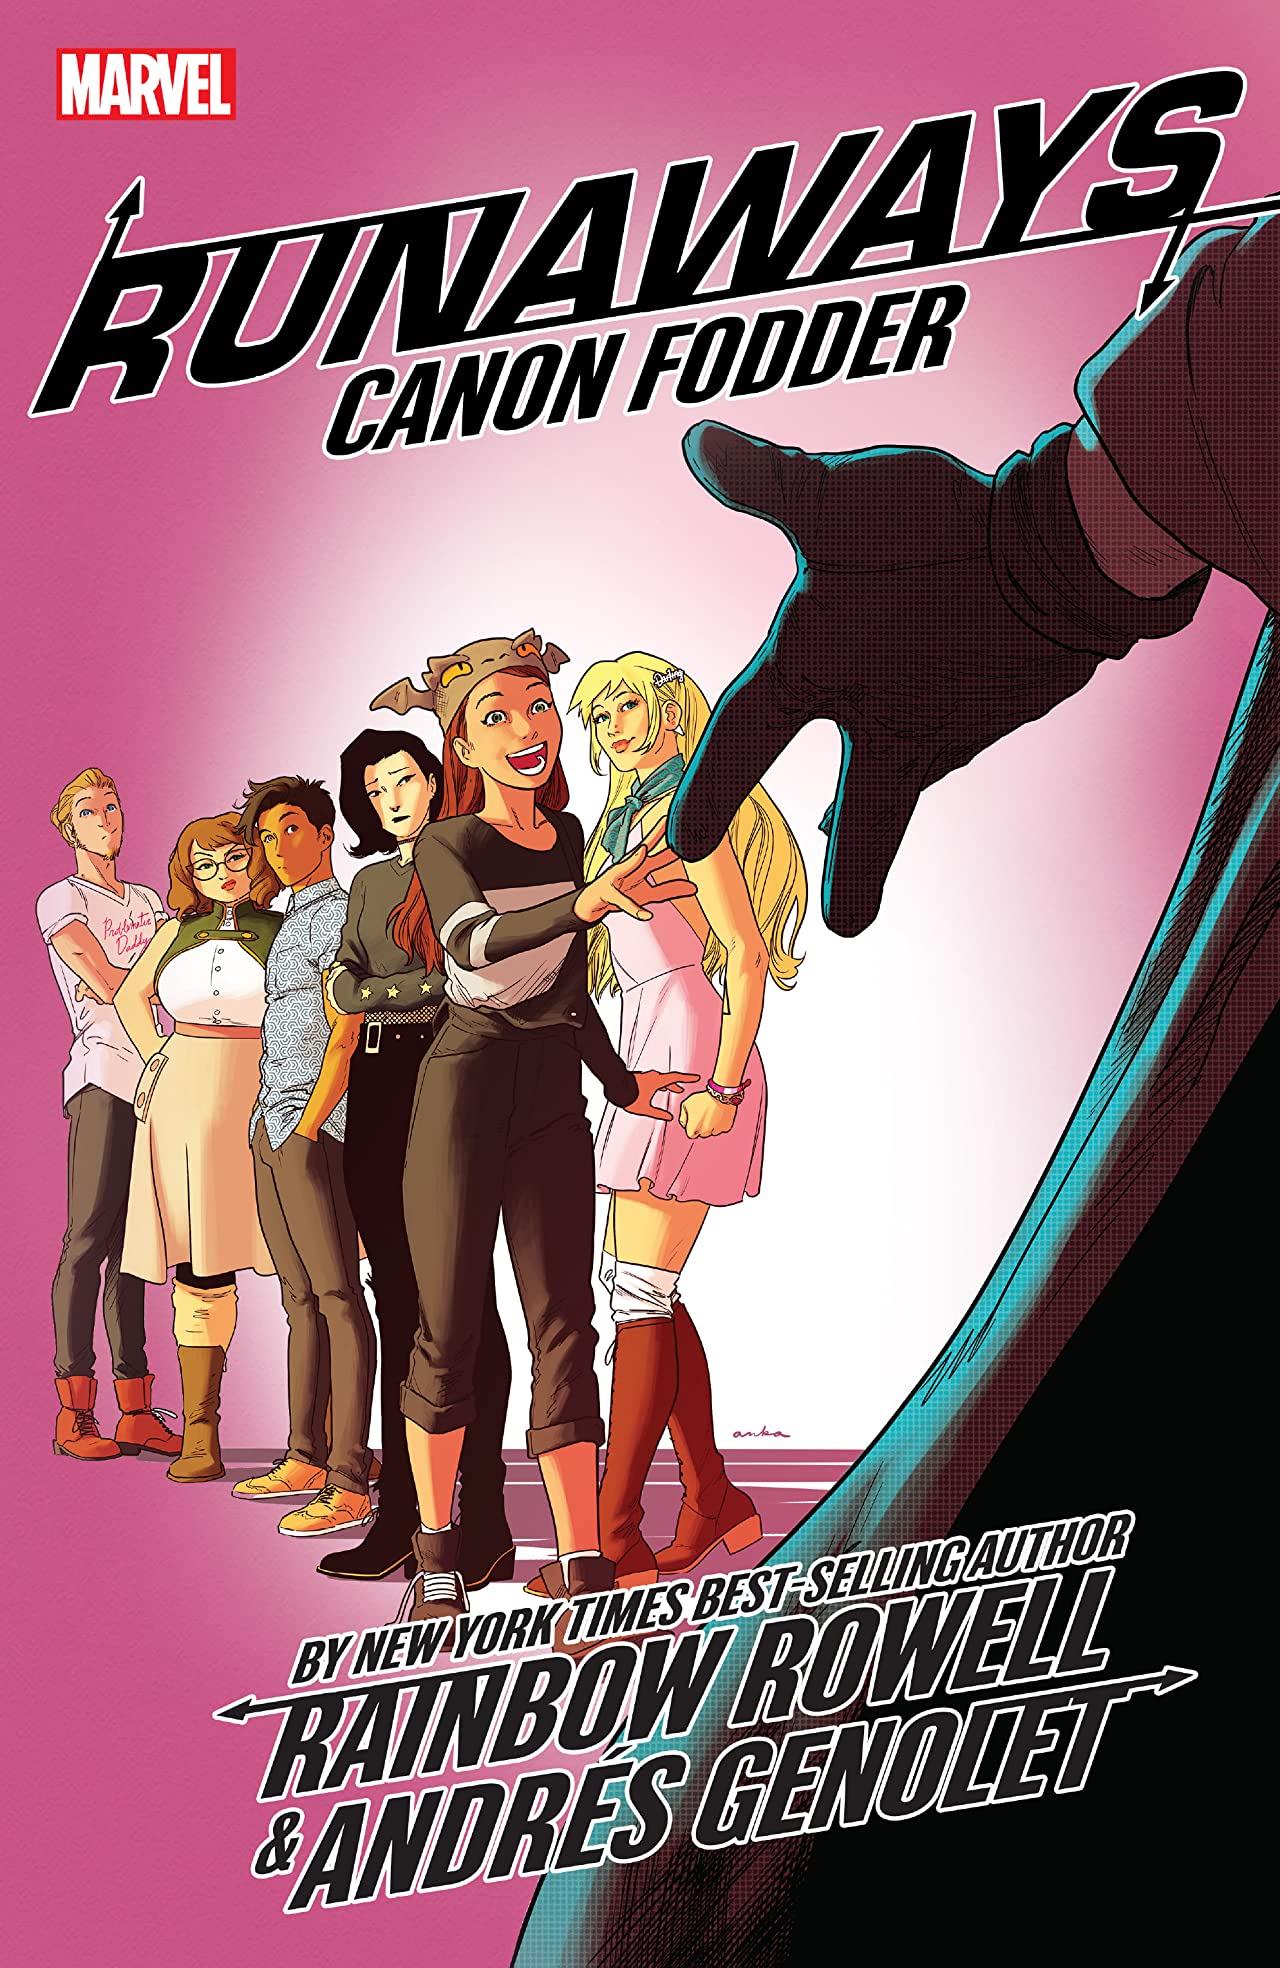 Runaways, Vol. 5: Cannon Fodder